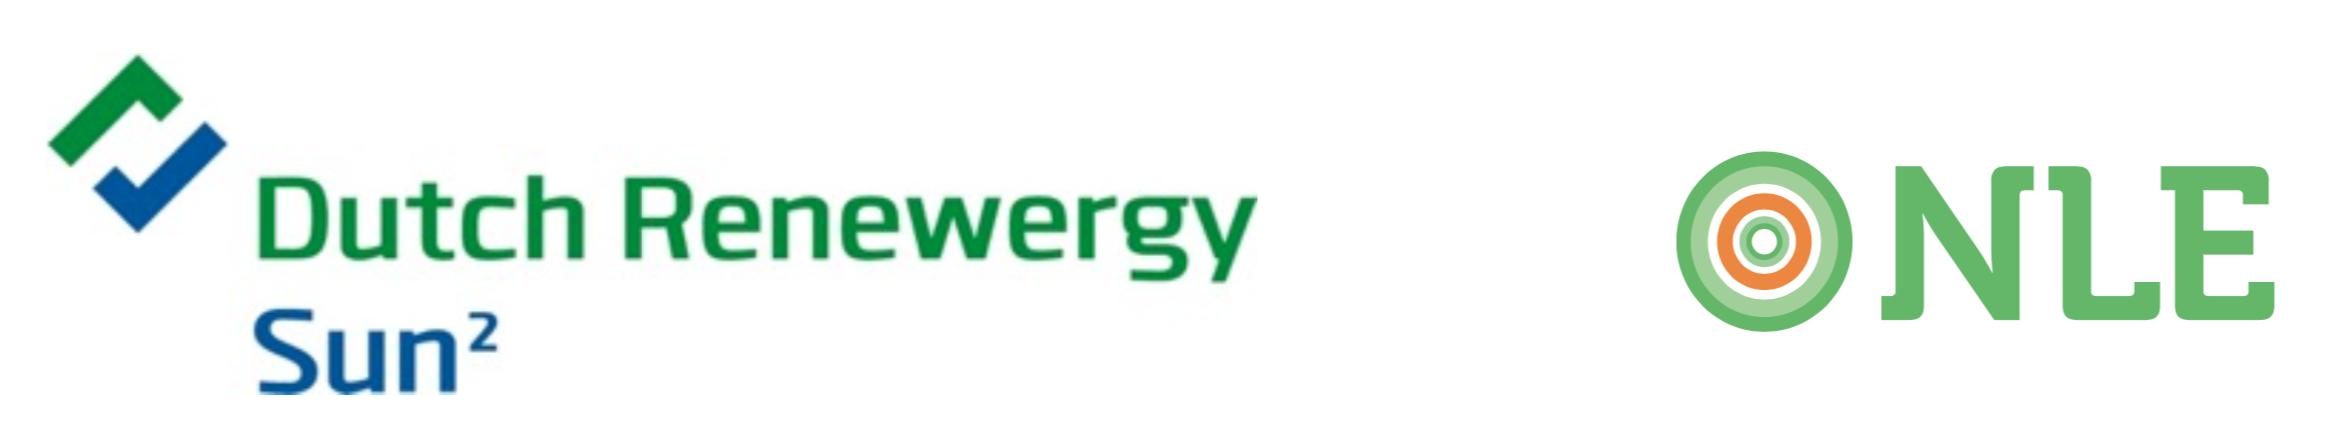 logos dutch renewergy NLE.png